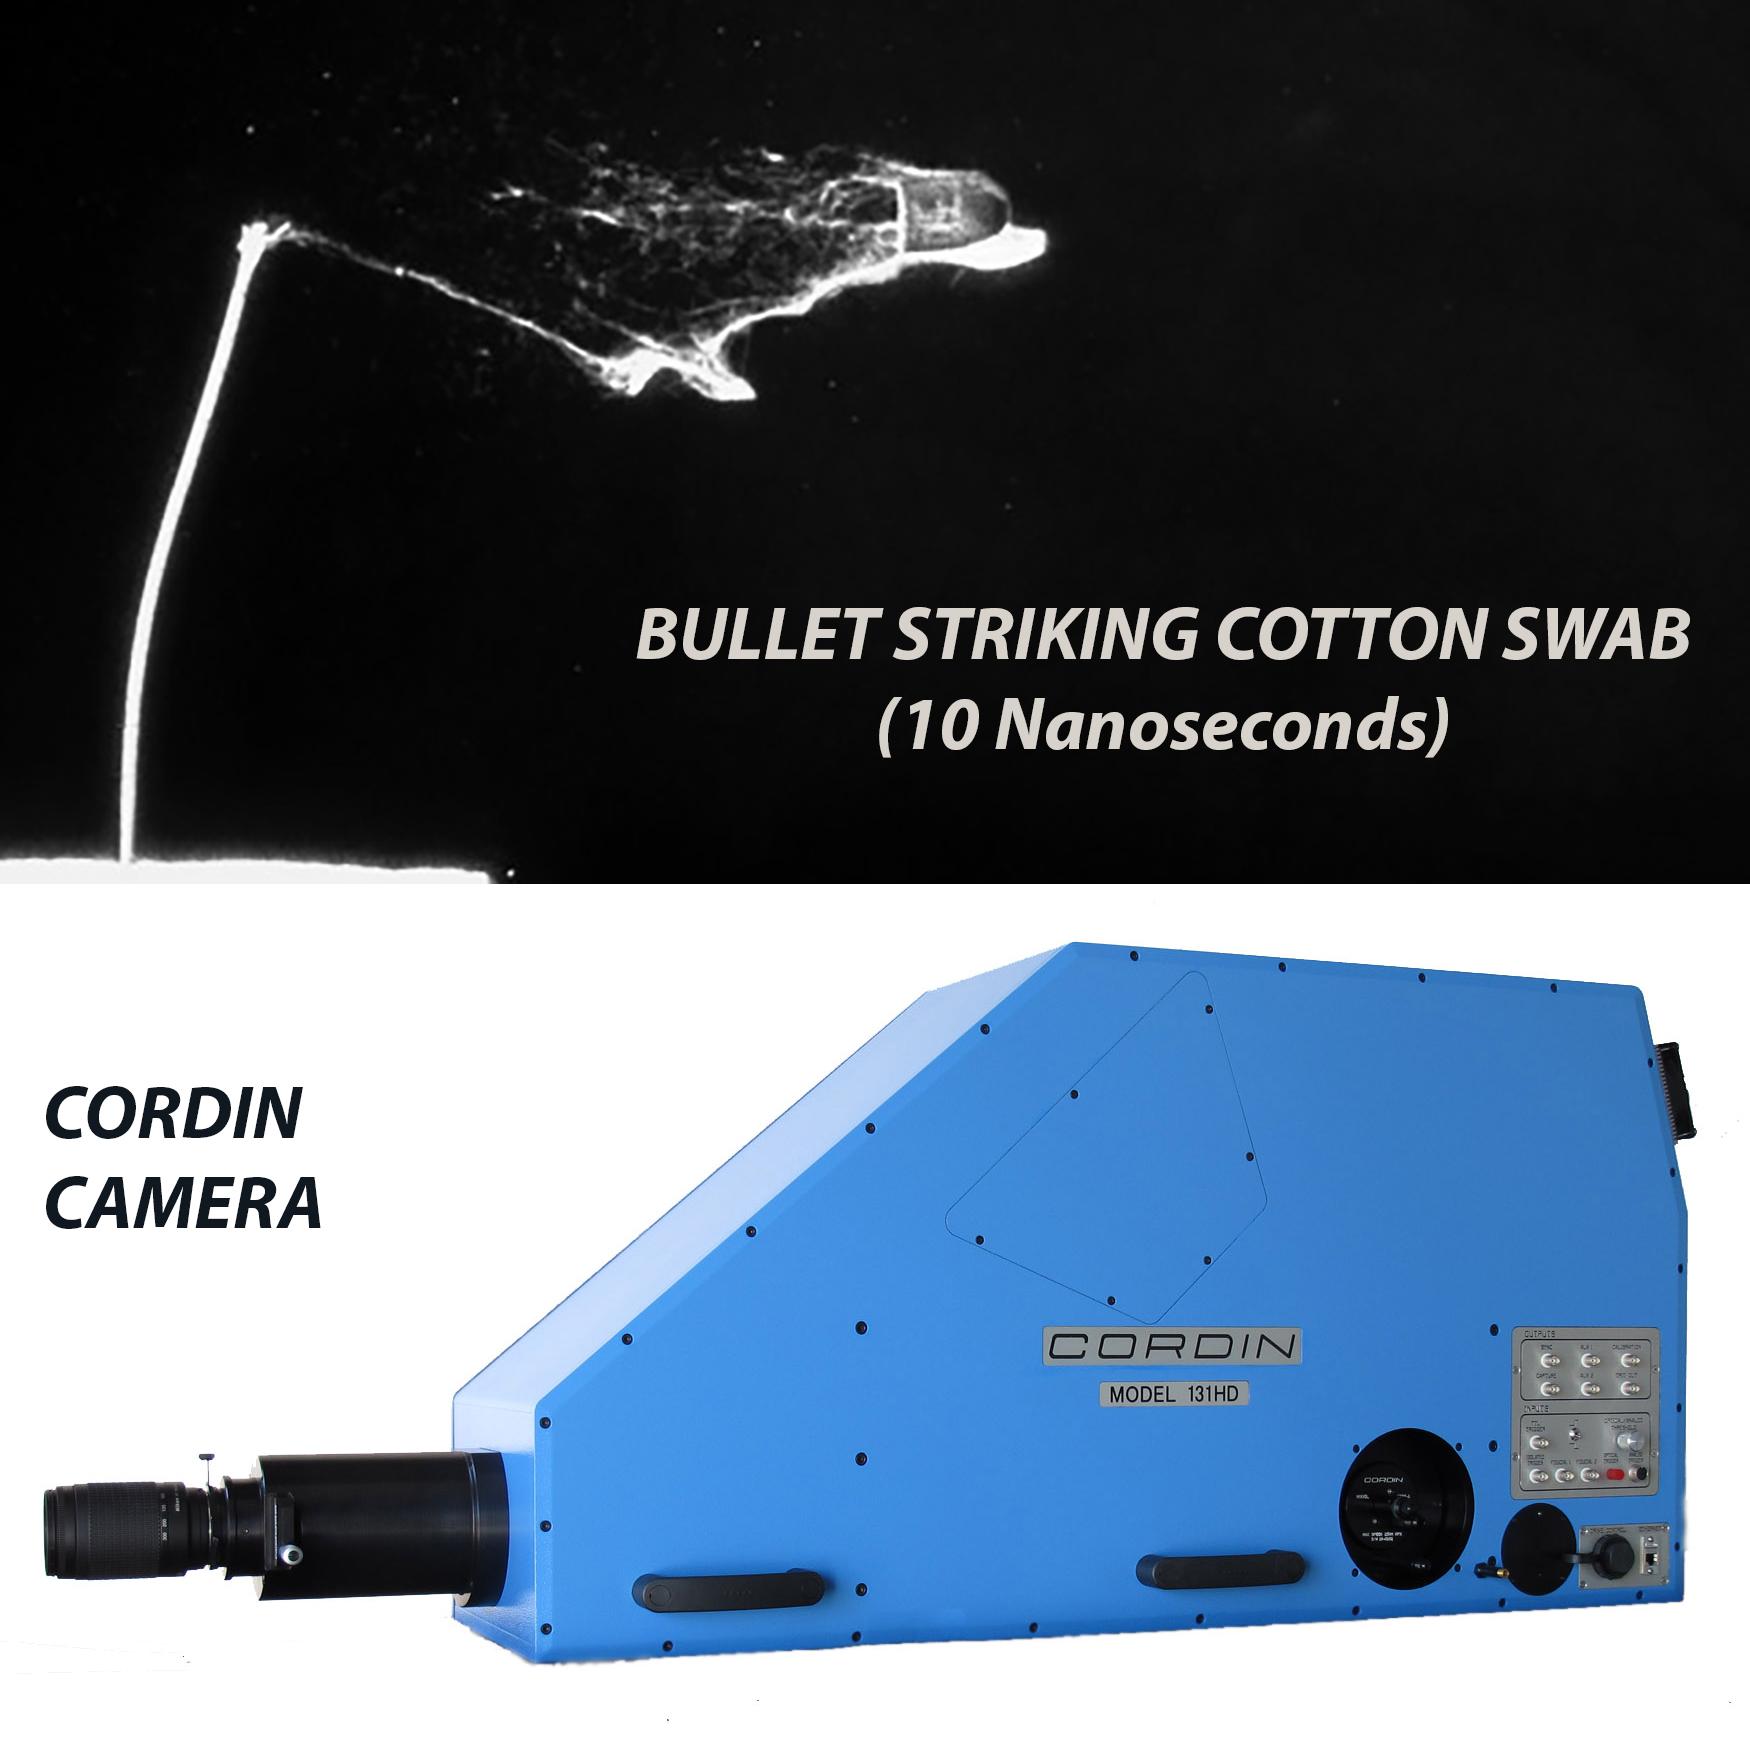 cordin scientific imaging ultra high speed cameras